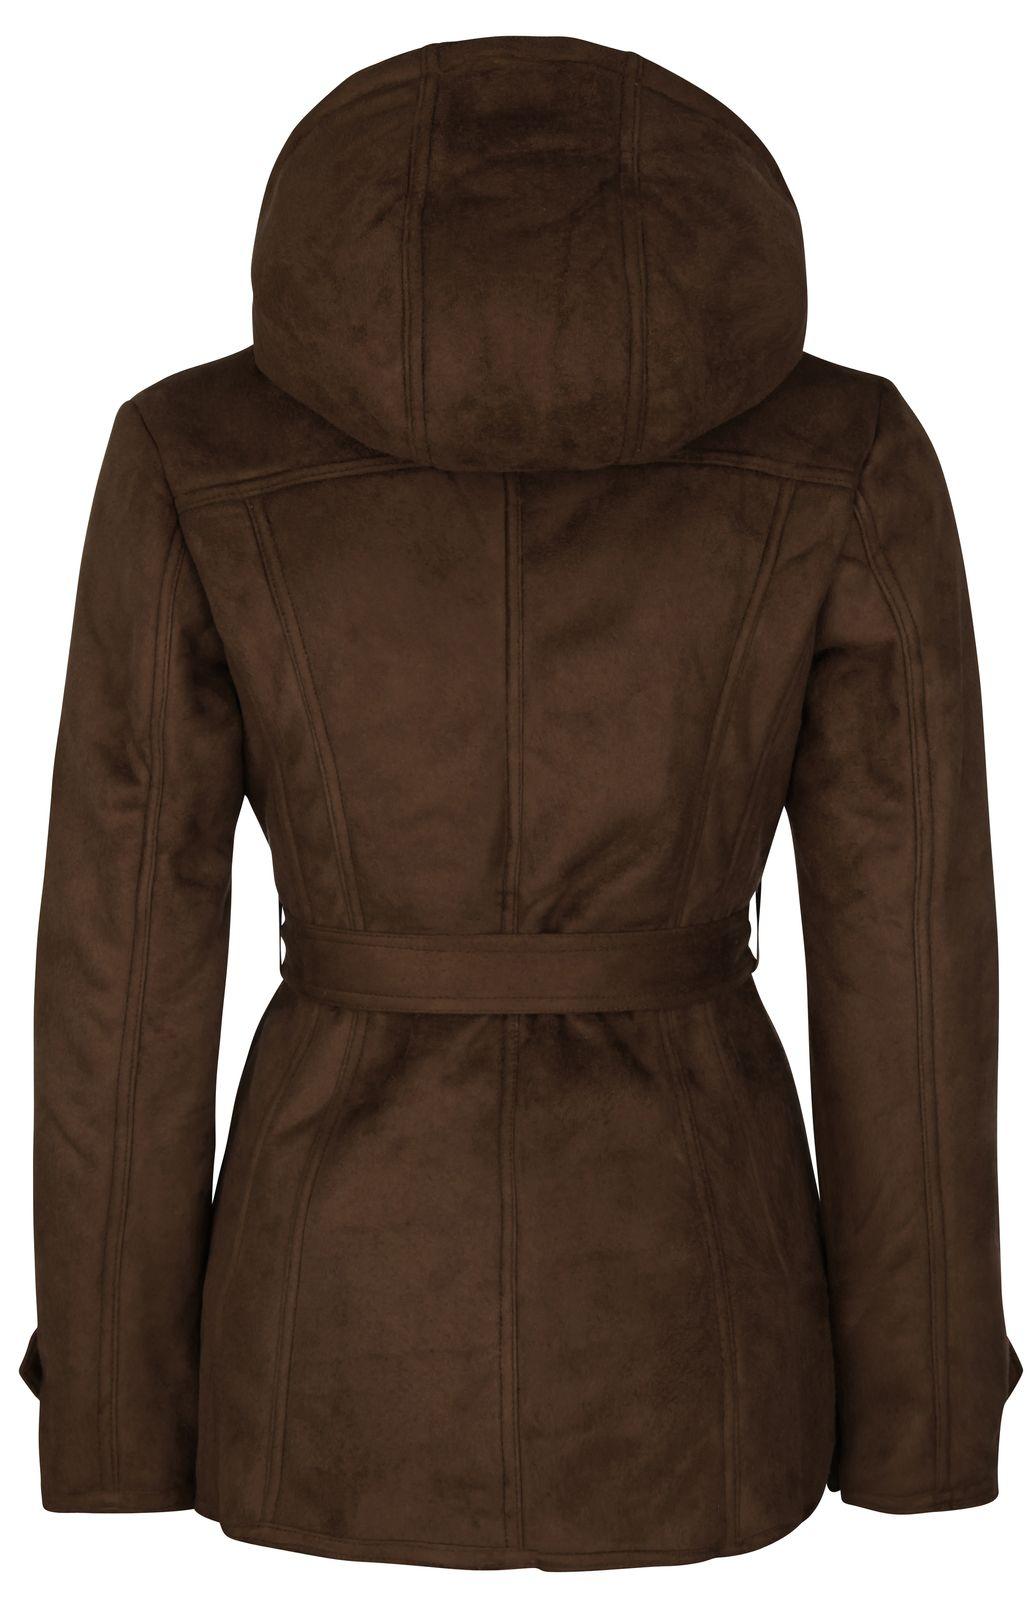 Damen Mäntel & Damen Jacken SALE Online Shop & Outlet 46 4